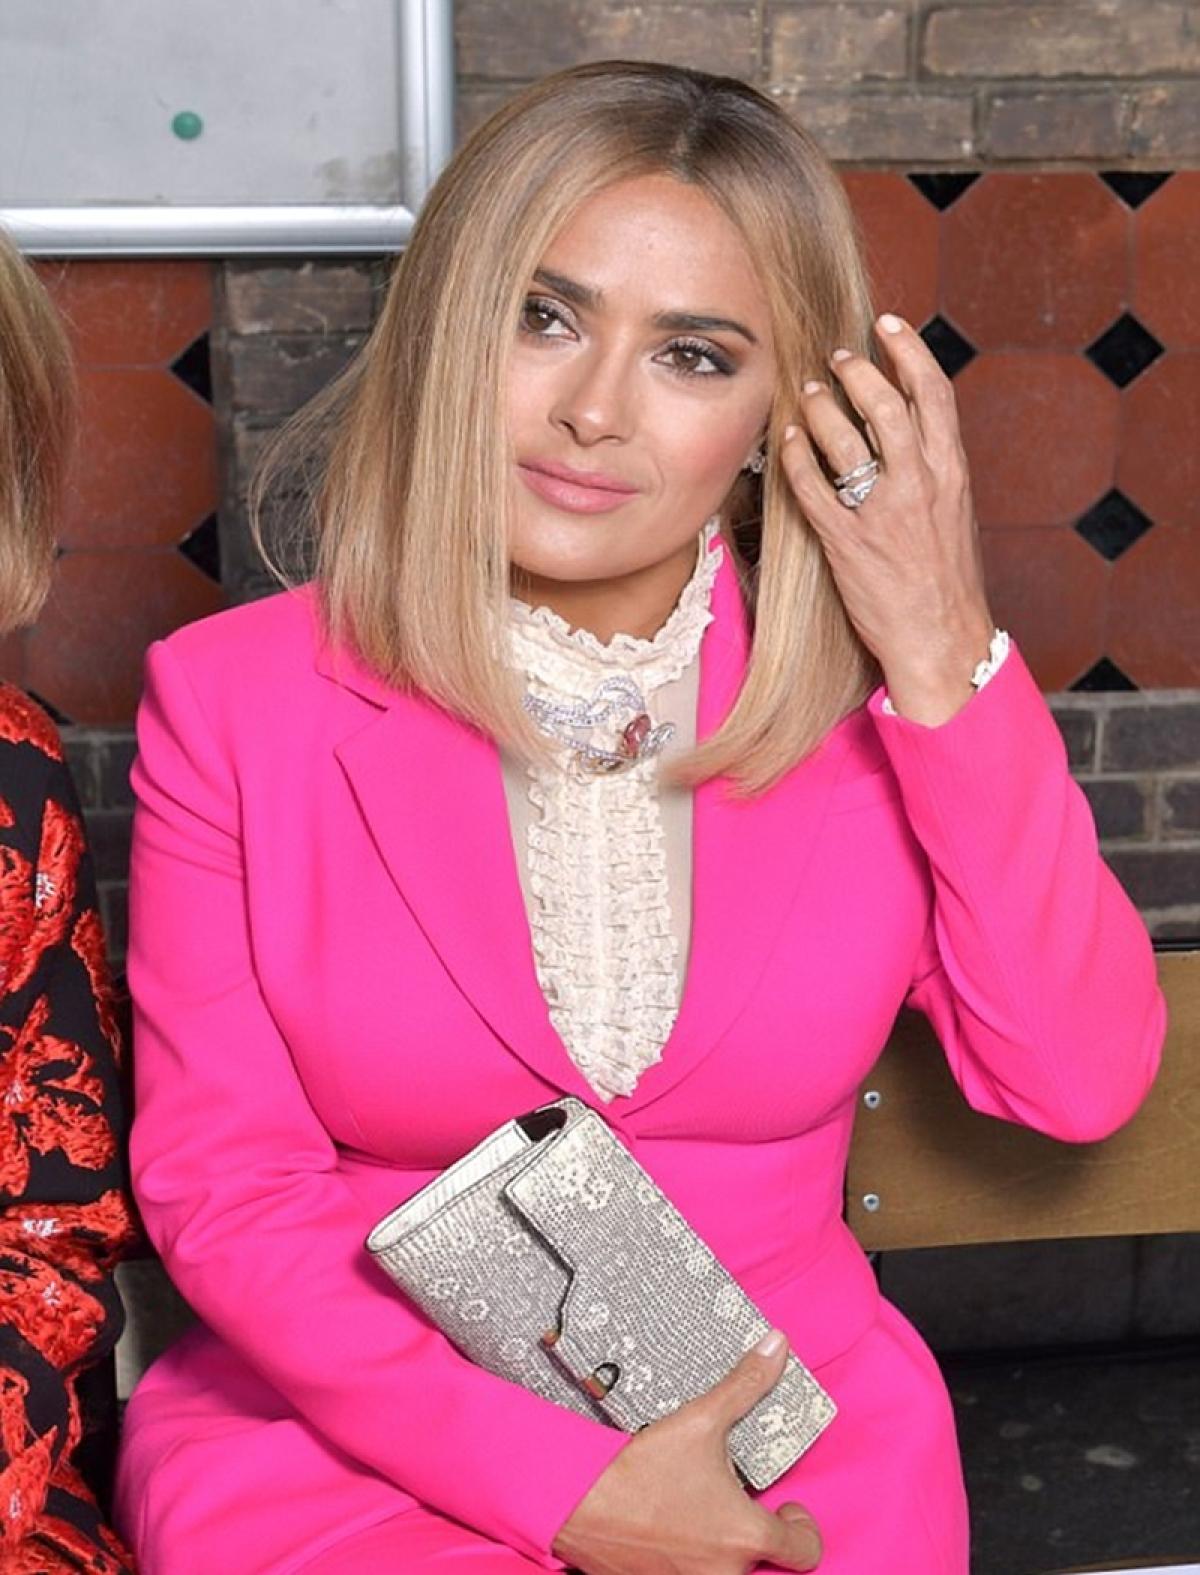 Salma Hayek's new blonde look will amaze you